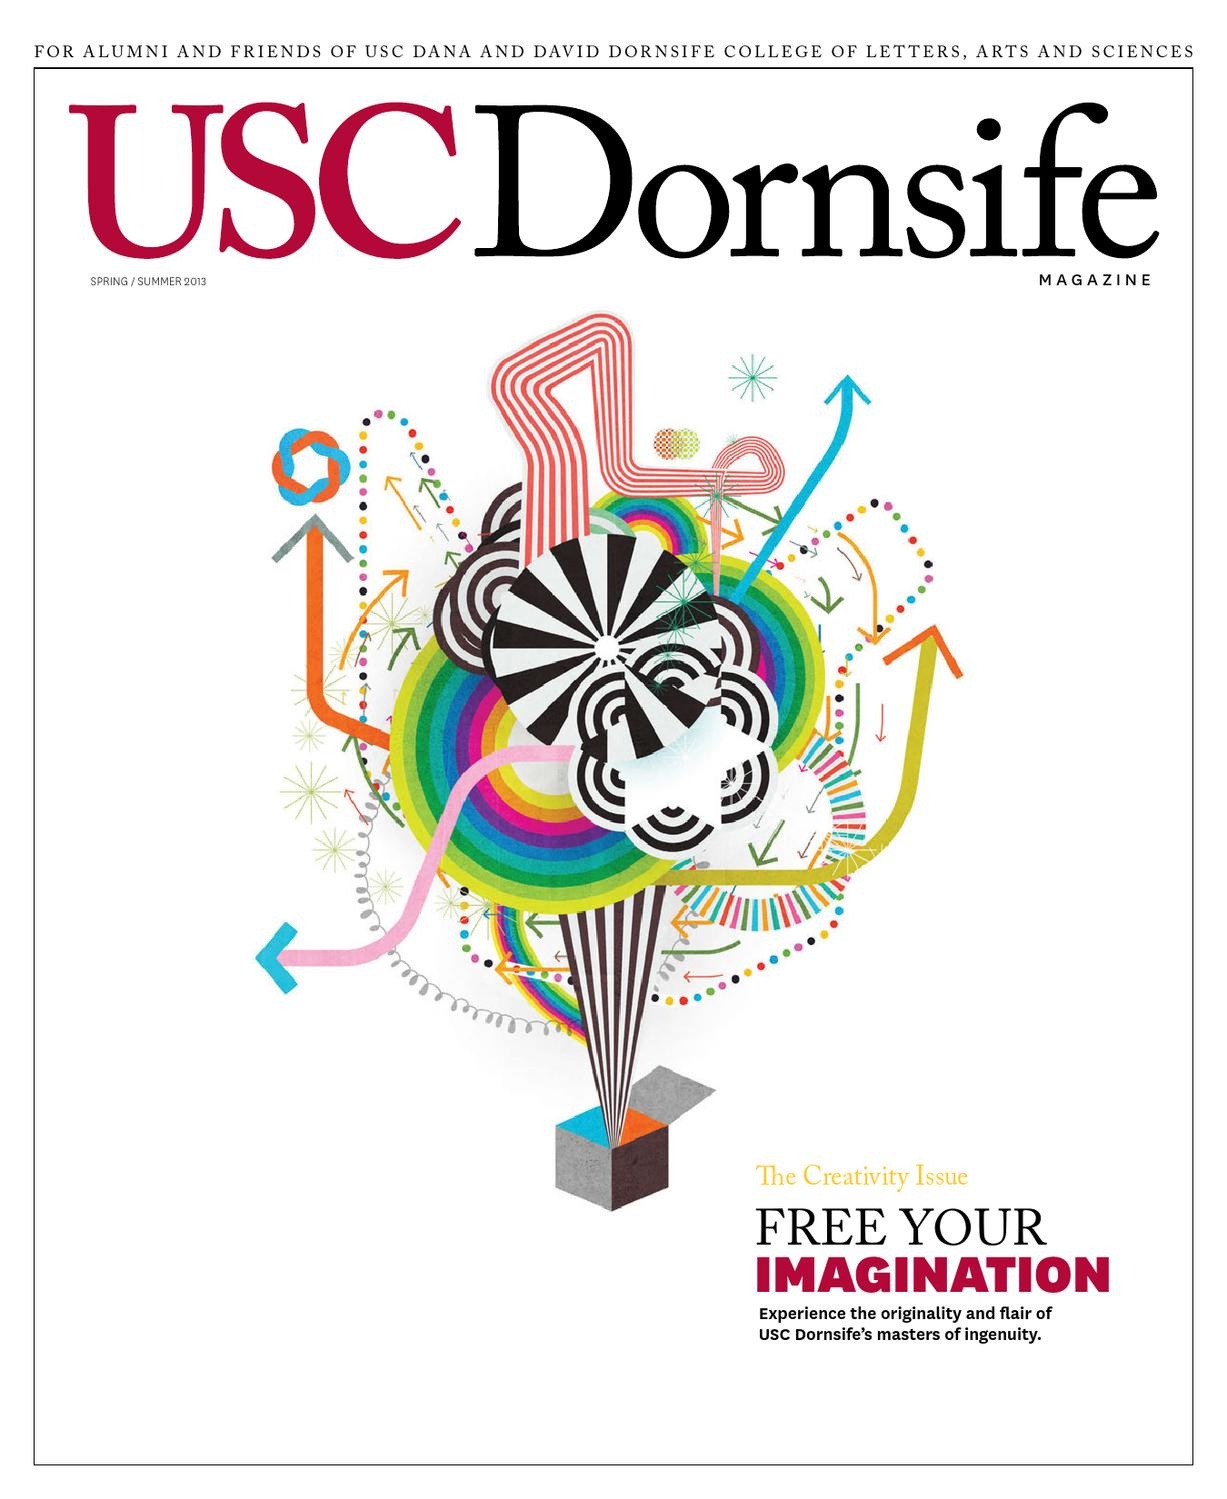 USC Dornsife Magazine by USC Dornsife Office of Communication - issuu